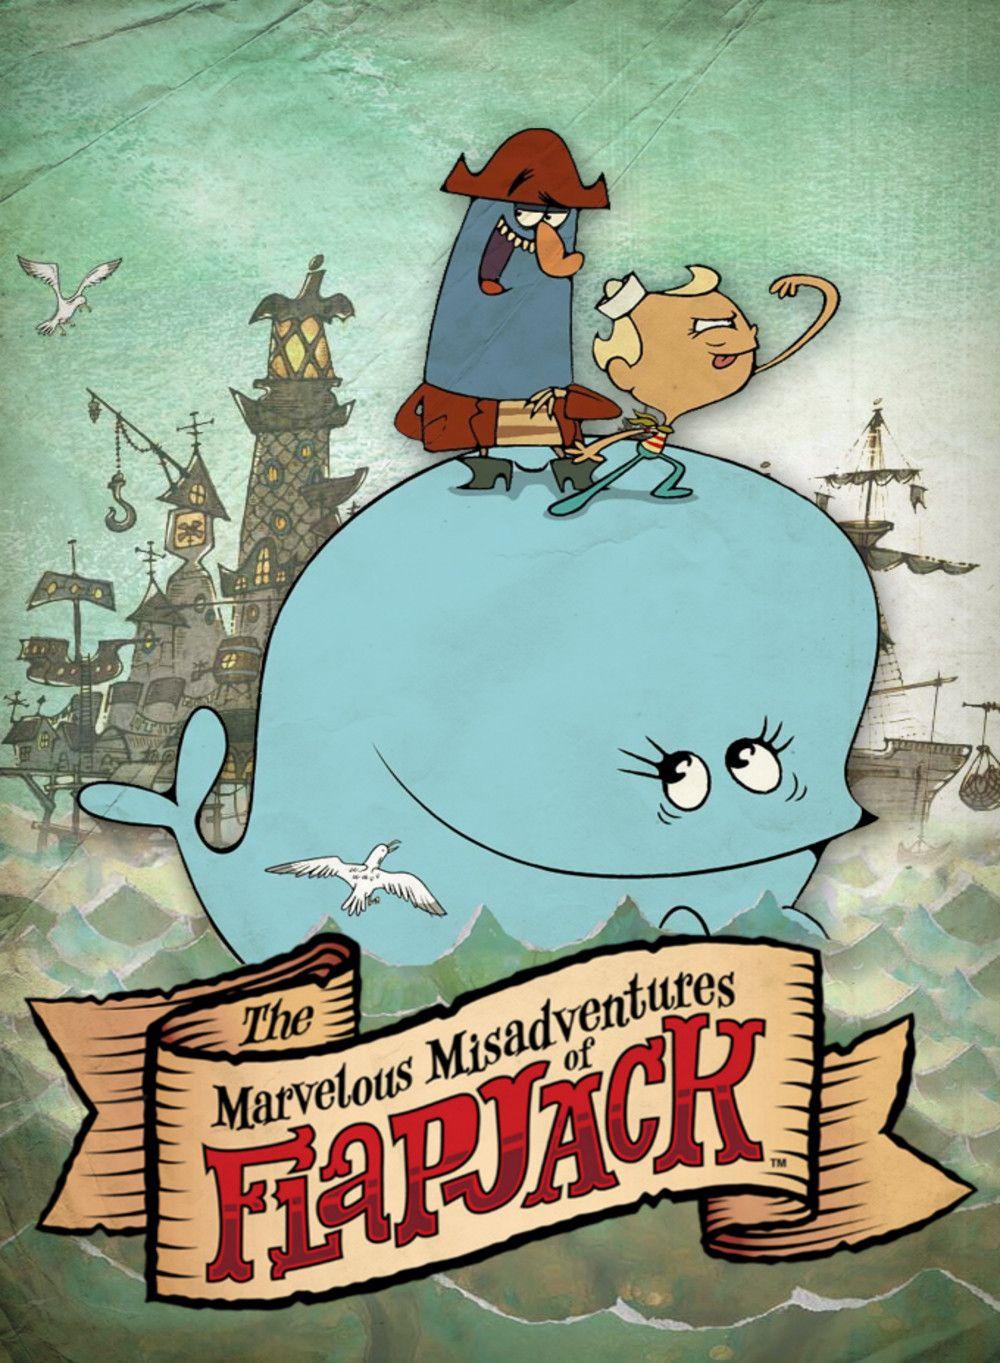 The Marvelous Misadventures of Flapjack (Van Orman)